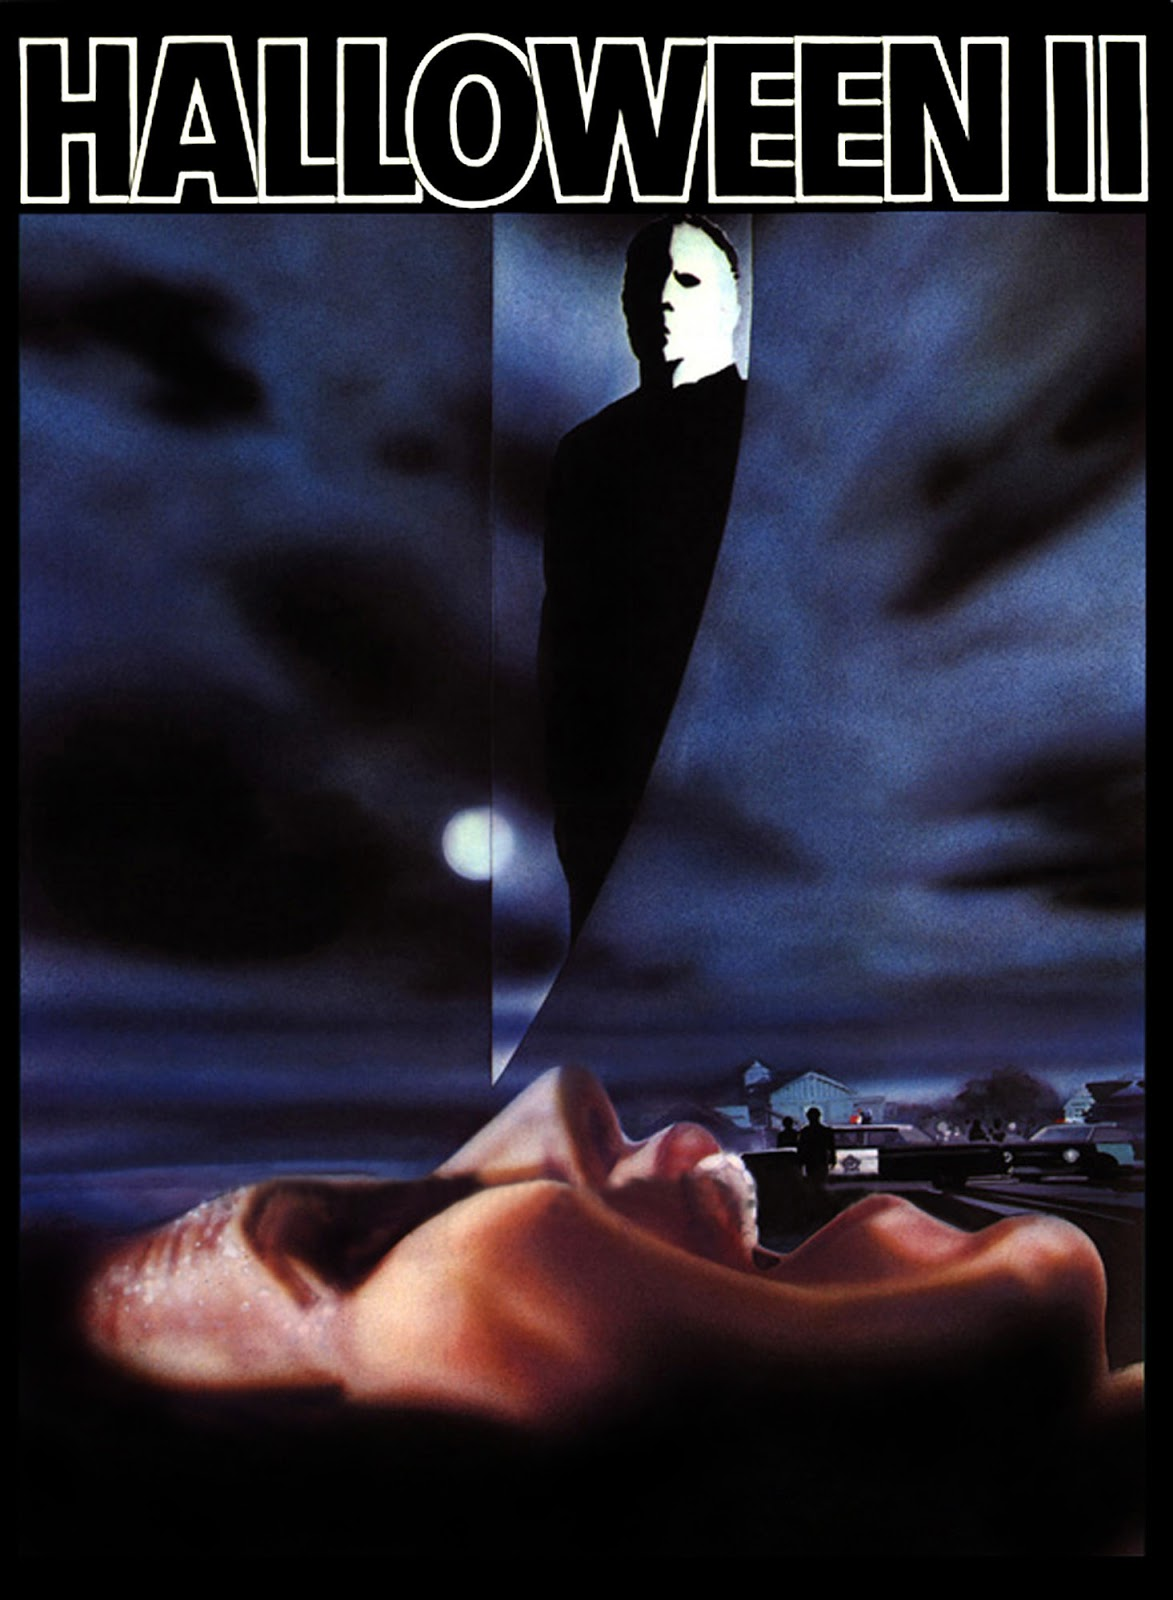 Happyotter: HALLOWEEN II (1981)